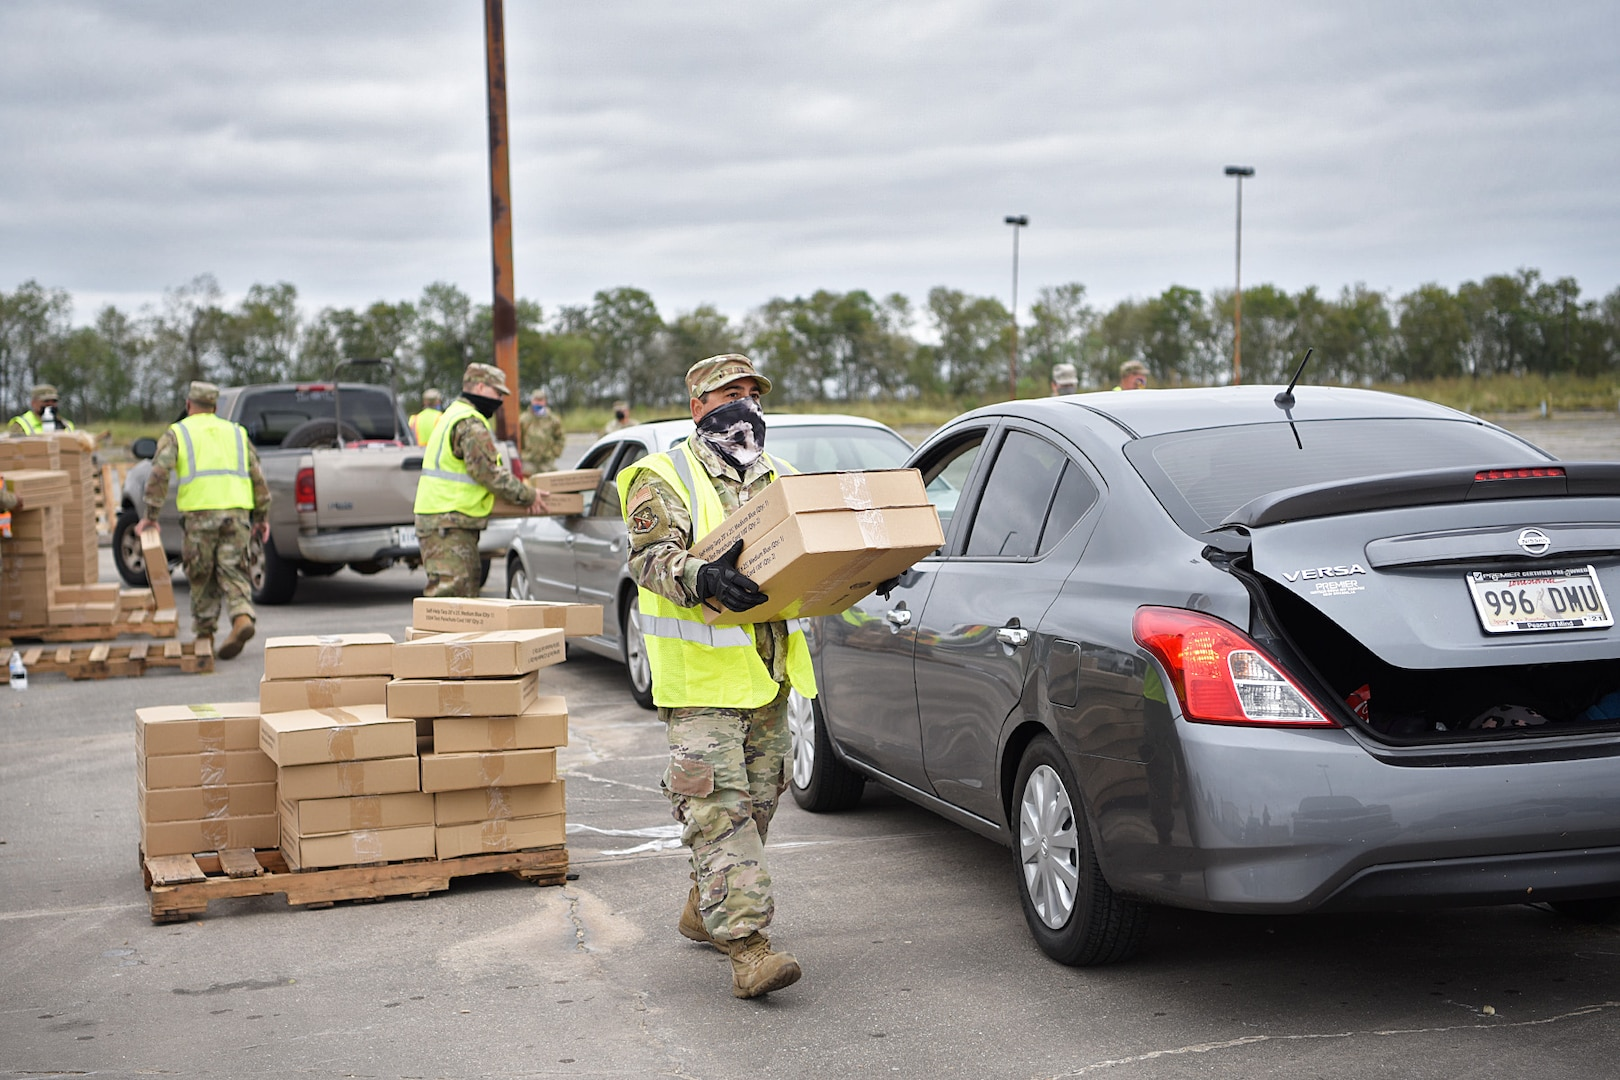 Airmen of the Louisiana Air National Guard's 159th Fighter Wing distribute tarps to citizens following Hurricane Zeta in St. Bernard Parish, Louisiana, Oct. 30, 2020.